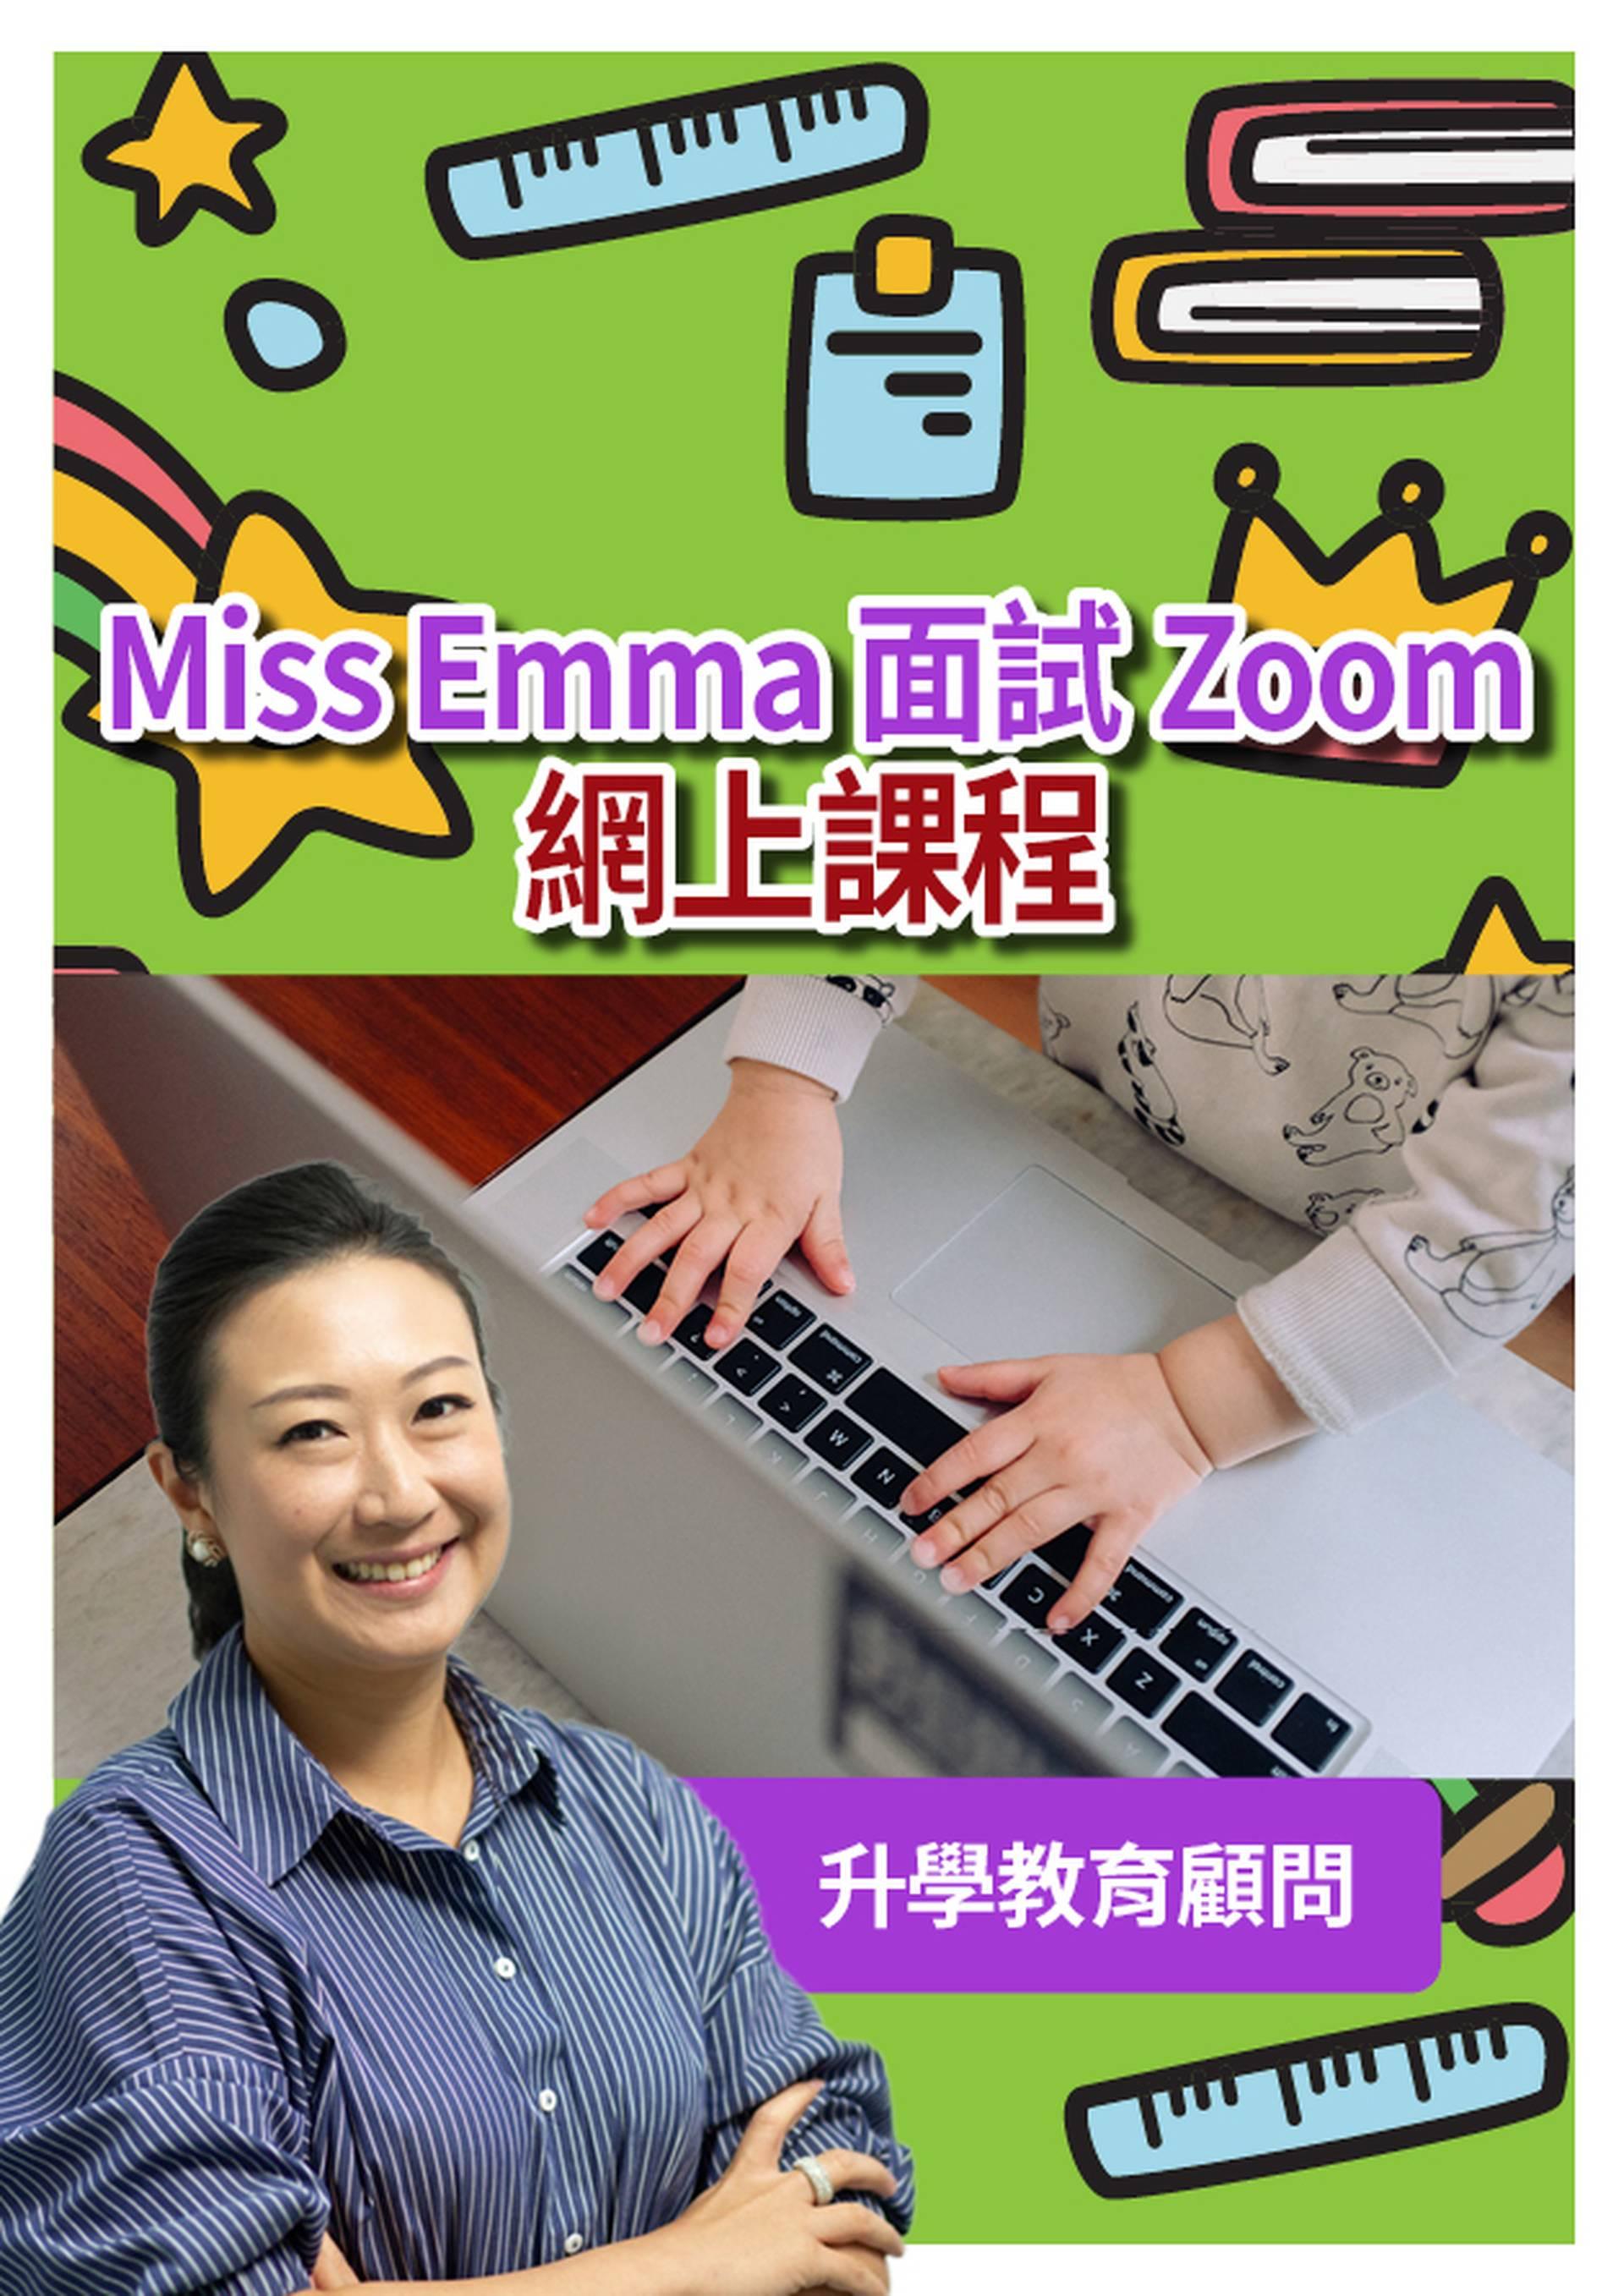 Miss Emma 面試Zoom網上課程